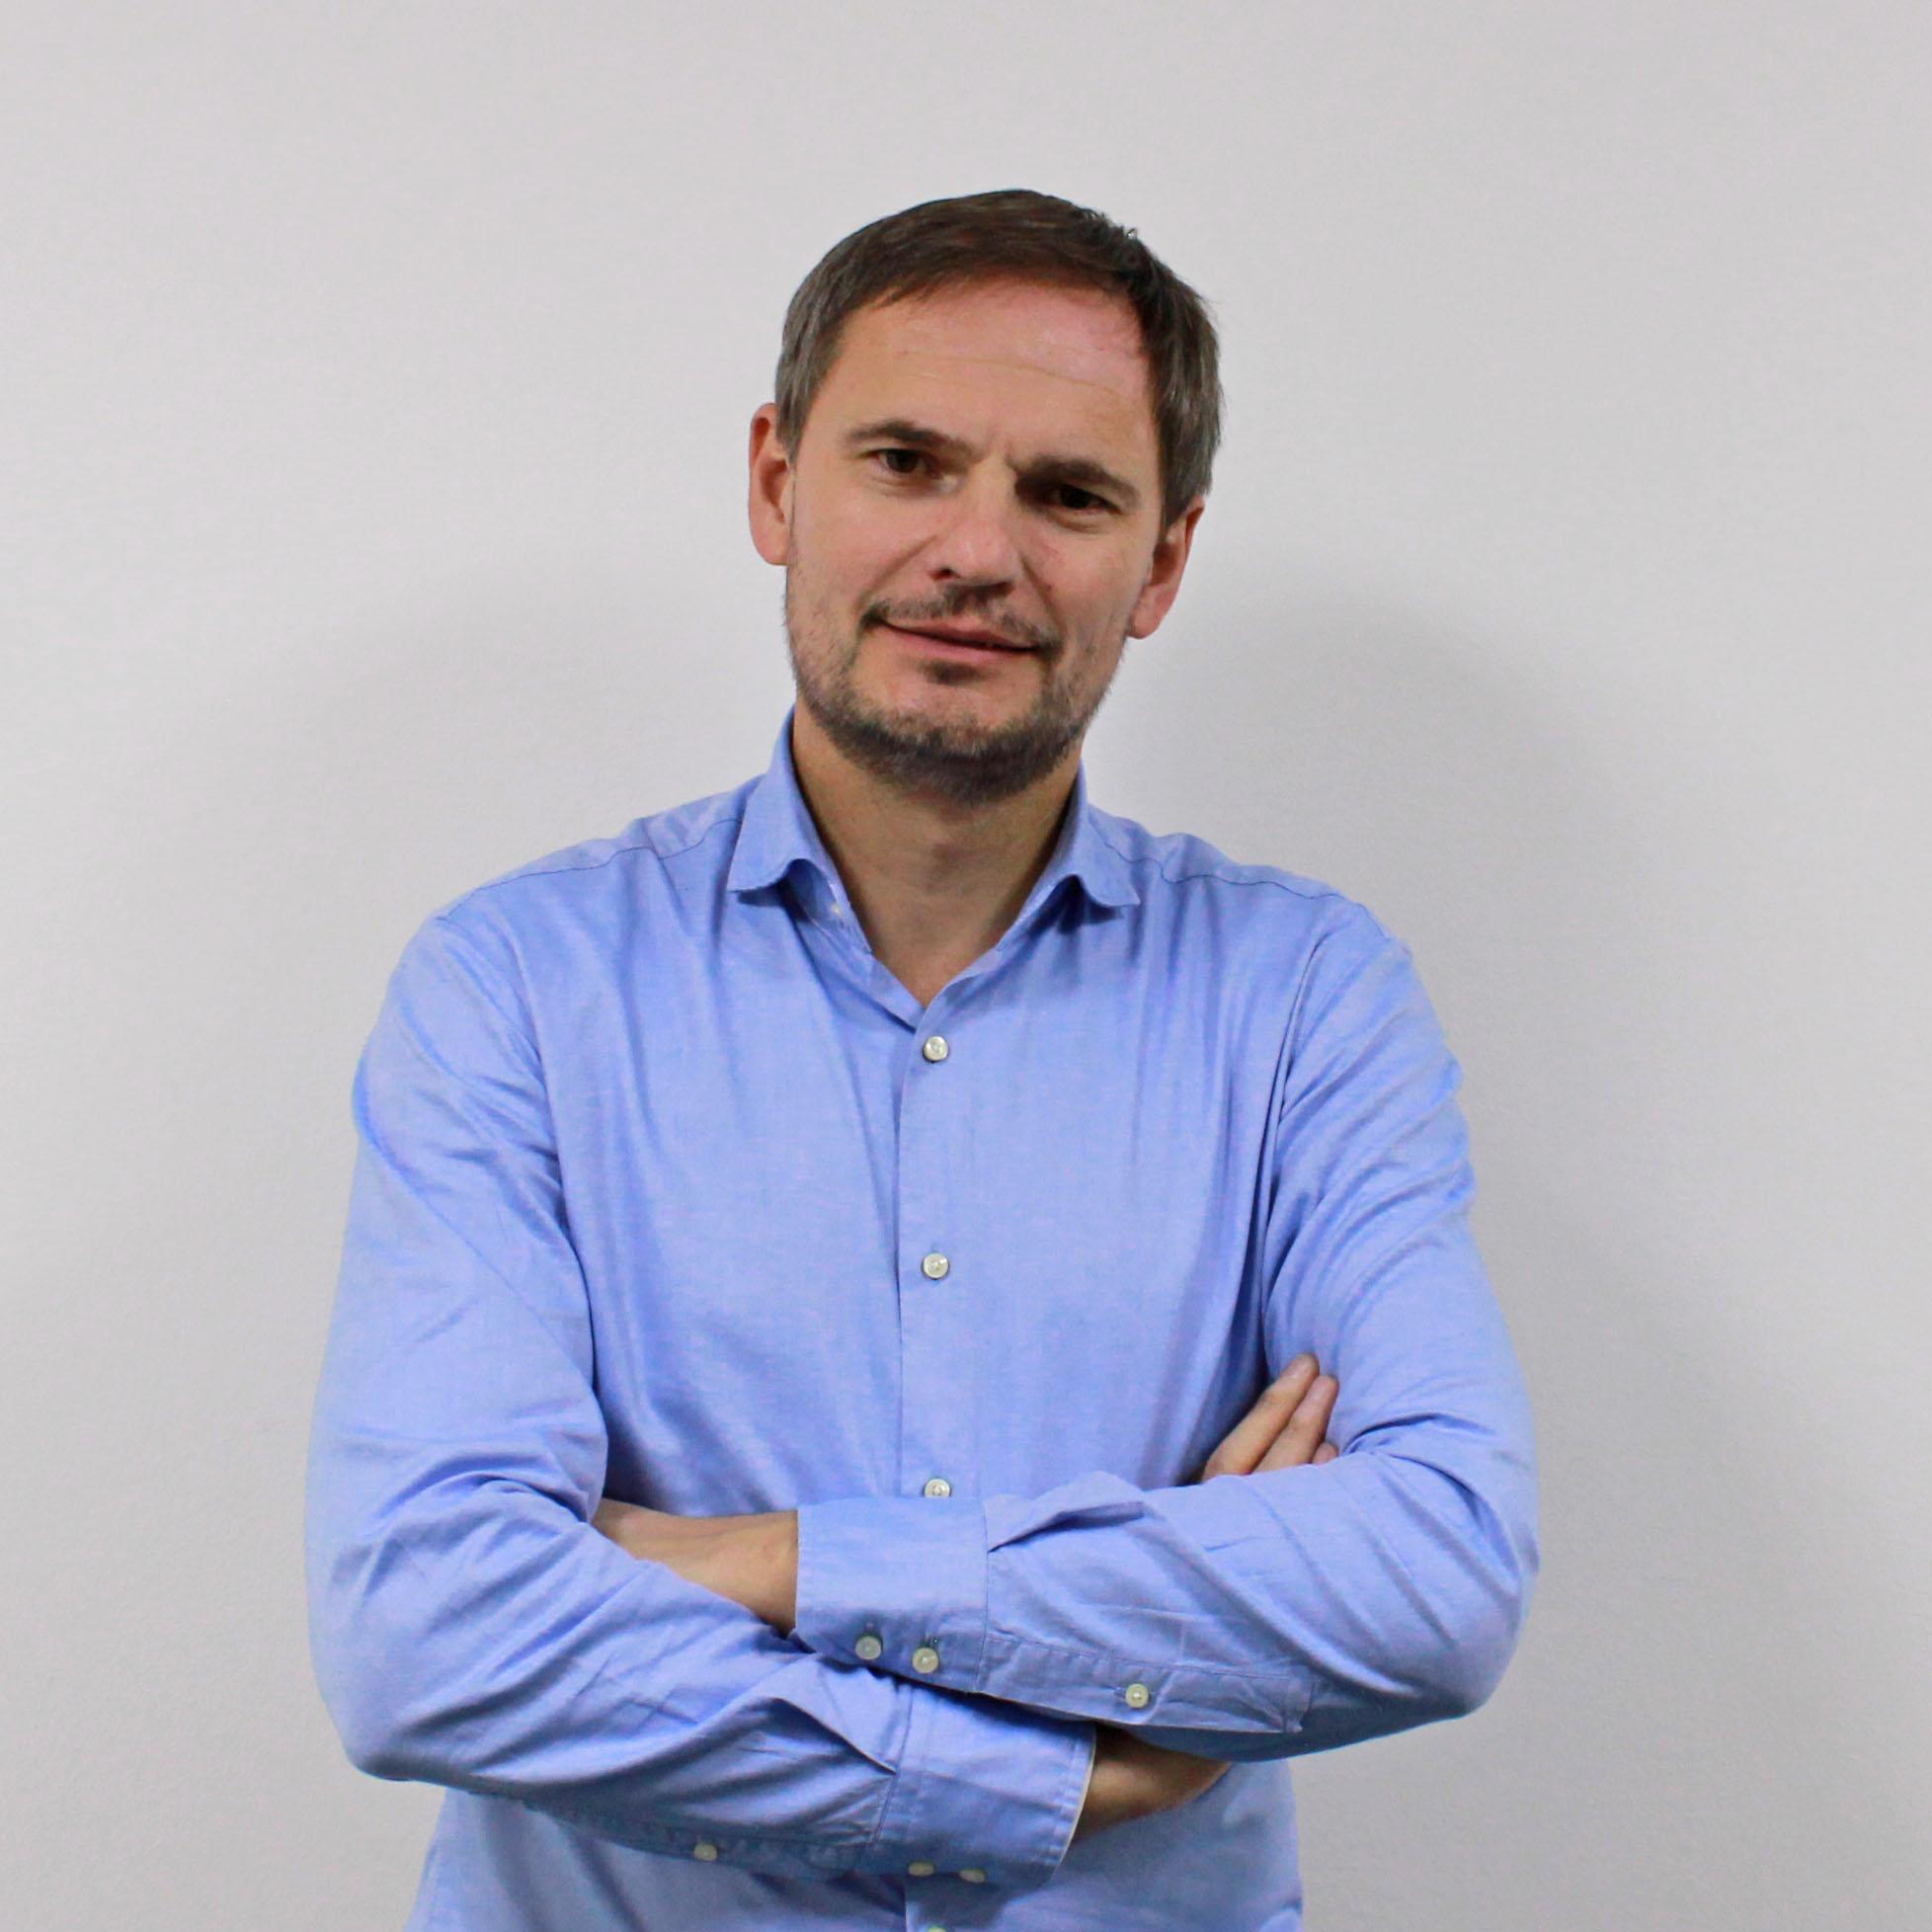 Dr. rer. medic. Petrit Beqiri